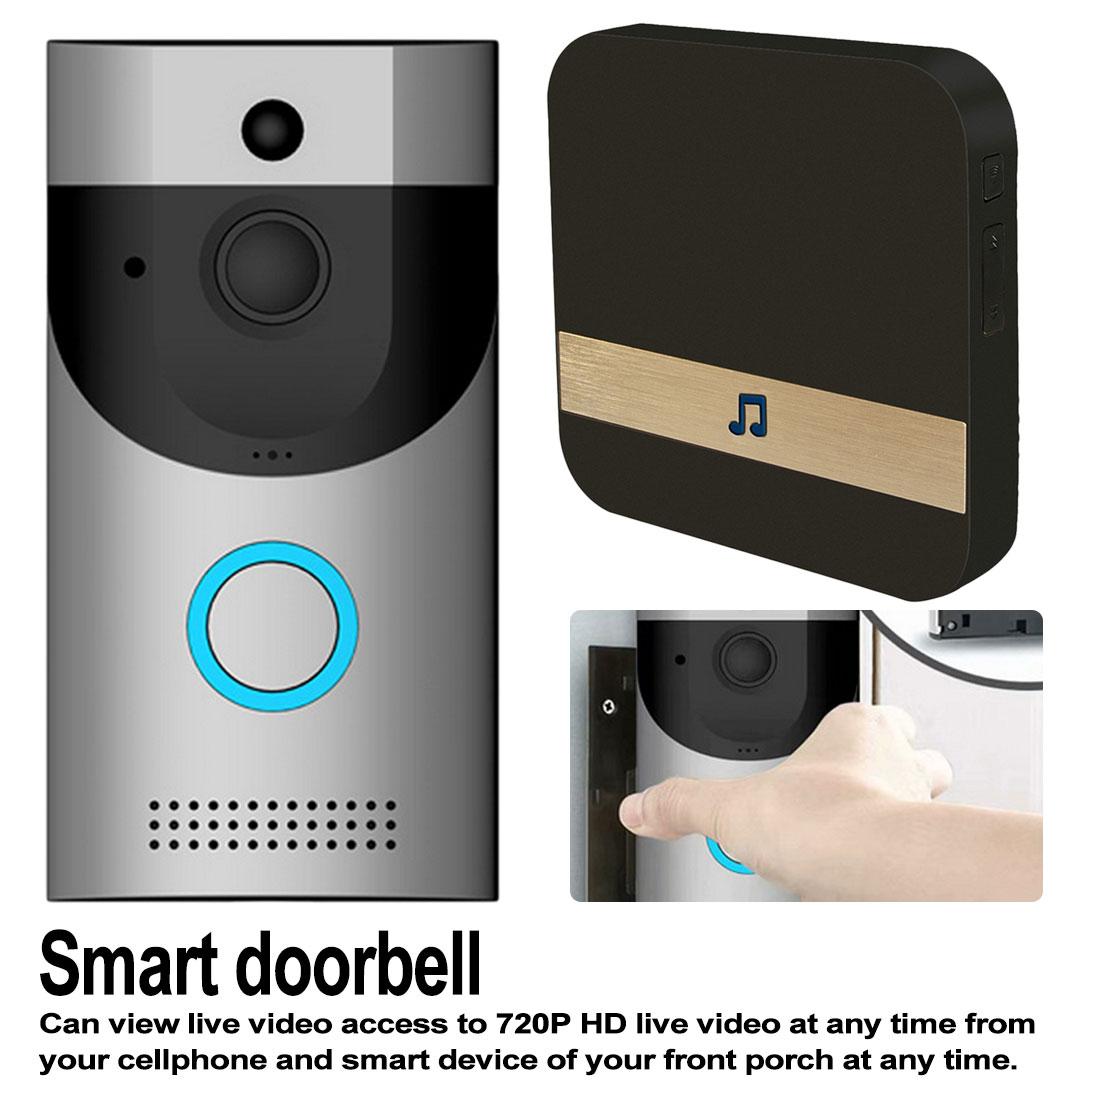 Wireless WIFI Doorbell B30 IP65 Waterproof Smart Video Door Chime 720P Wireless Intercom FIR Alarm IR Night Vision IP Camera